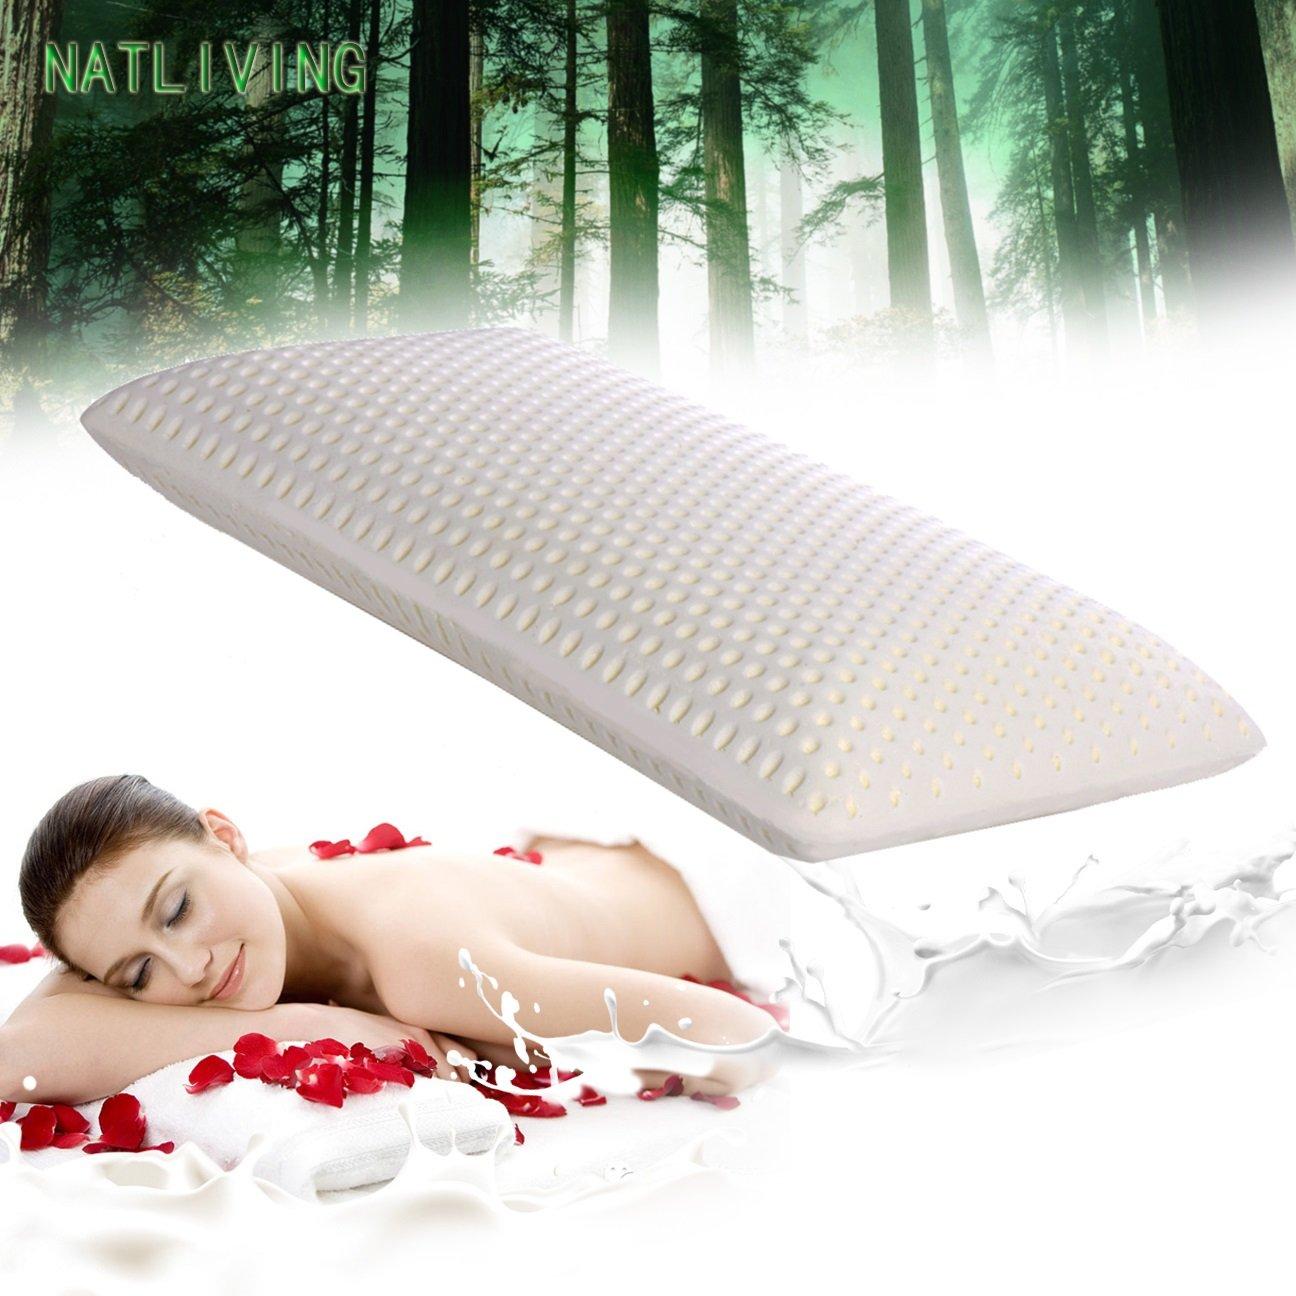 Thai Latex Foam Pillow Cervical Orthopedic 100% Natural Ventilated Pressure Release Cosmetic Thailand Latex Pillows